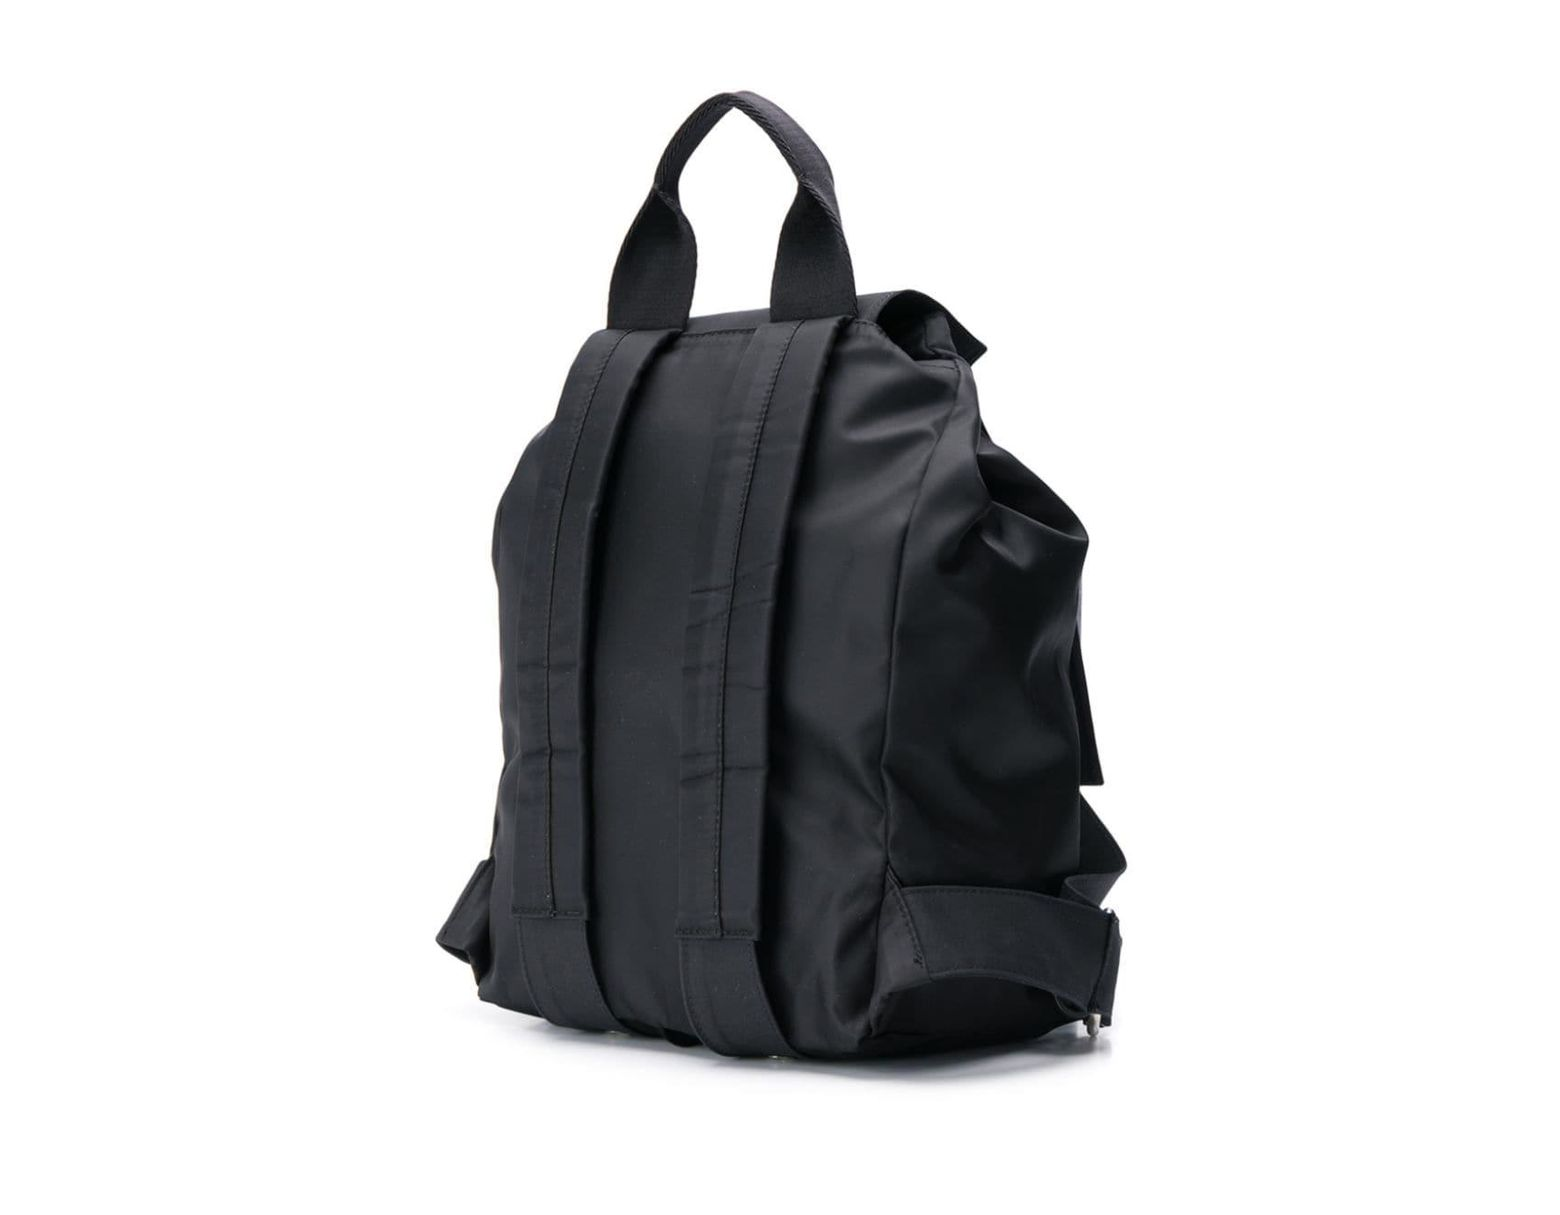 fb9dbd958 1017 ALYX 9SM 1017 Alyx 9sm Claw Tank Backpack in Black for Men - Save 40%  - Lyst